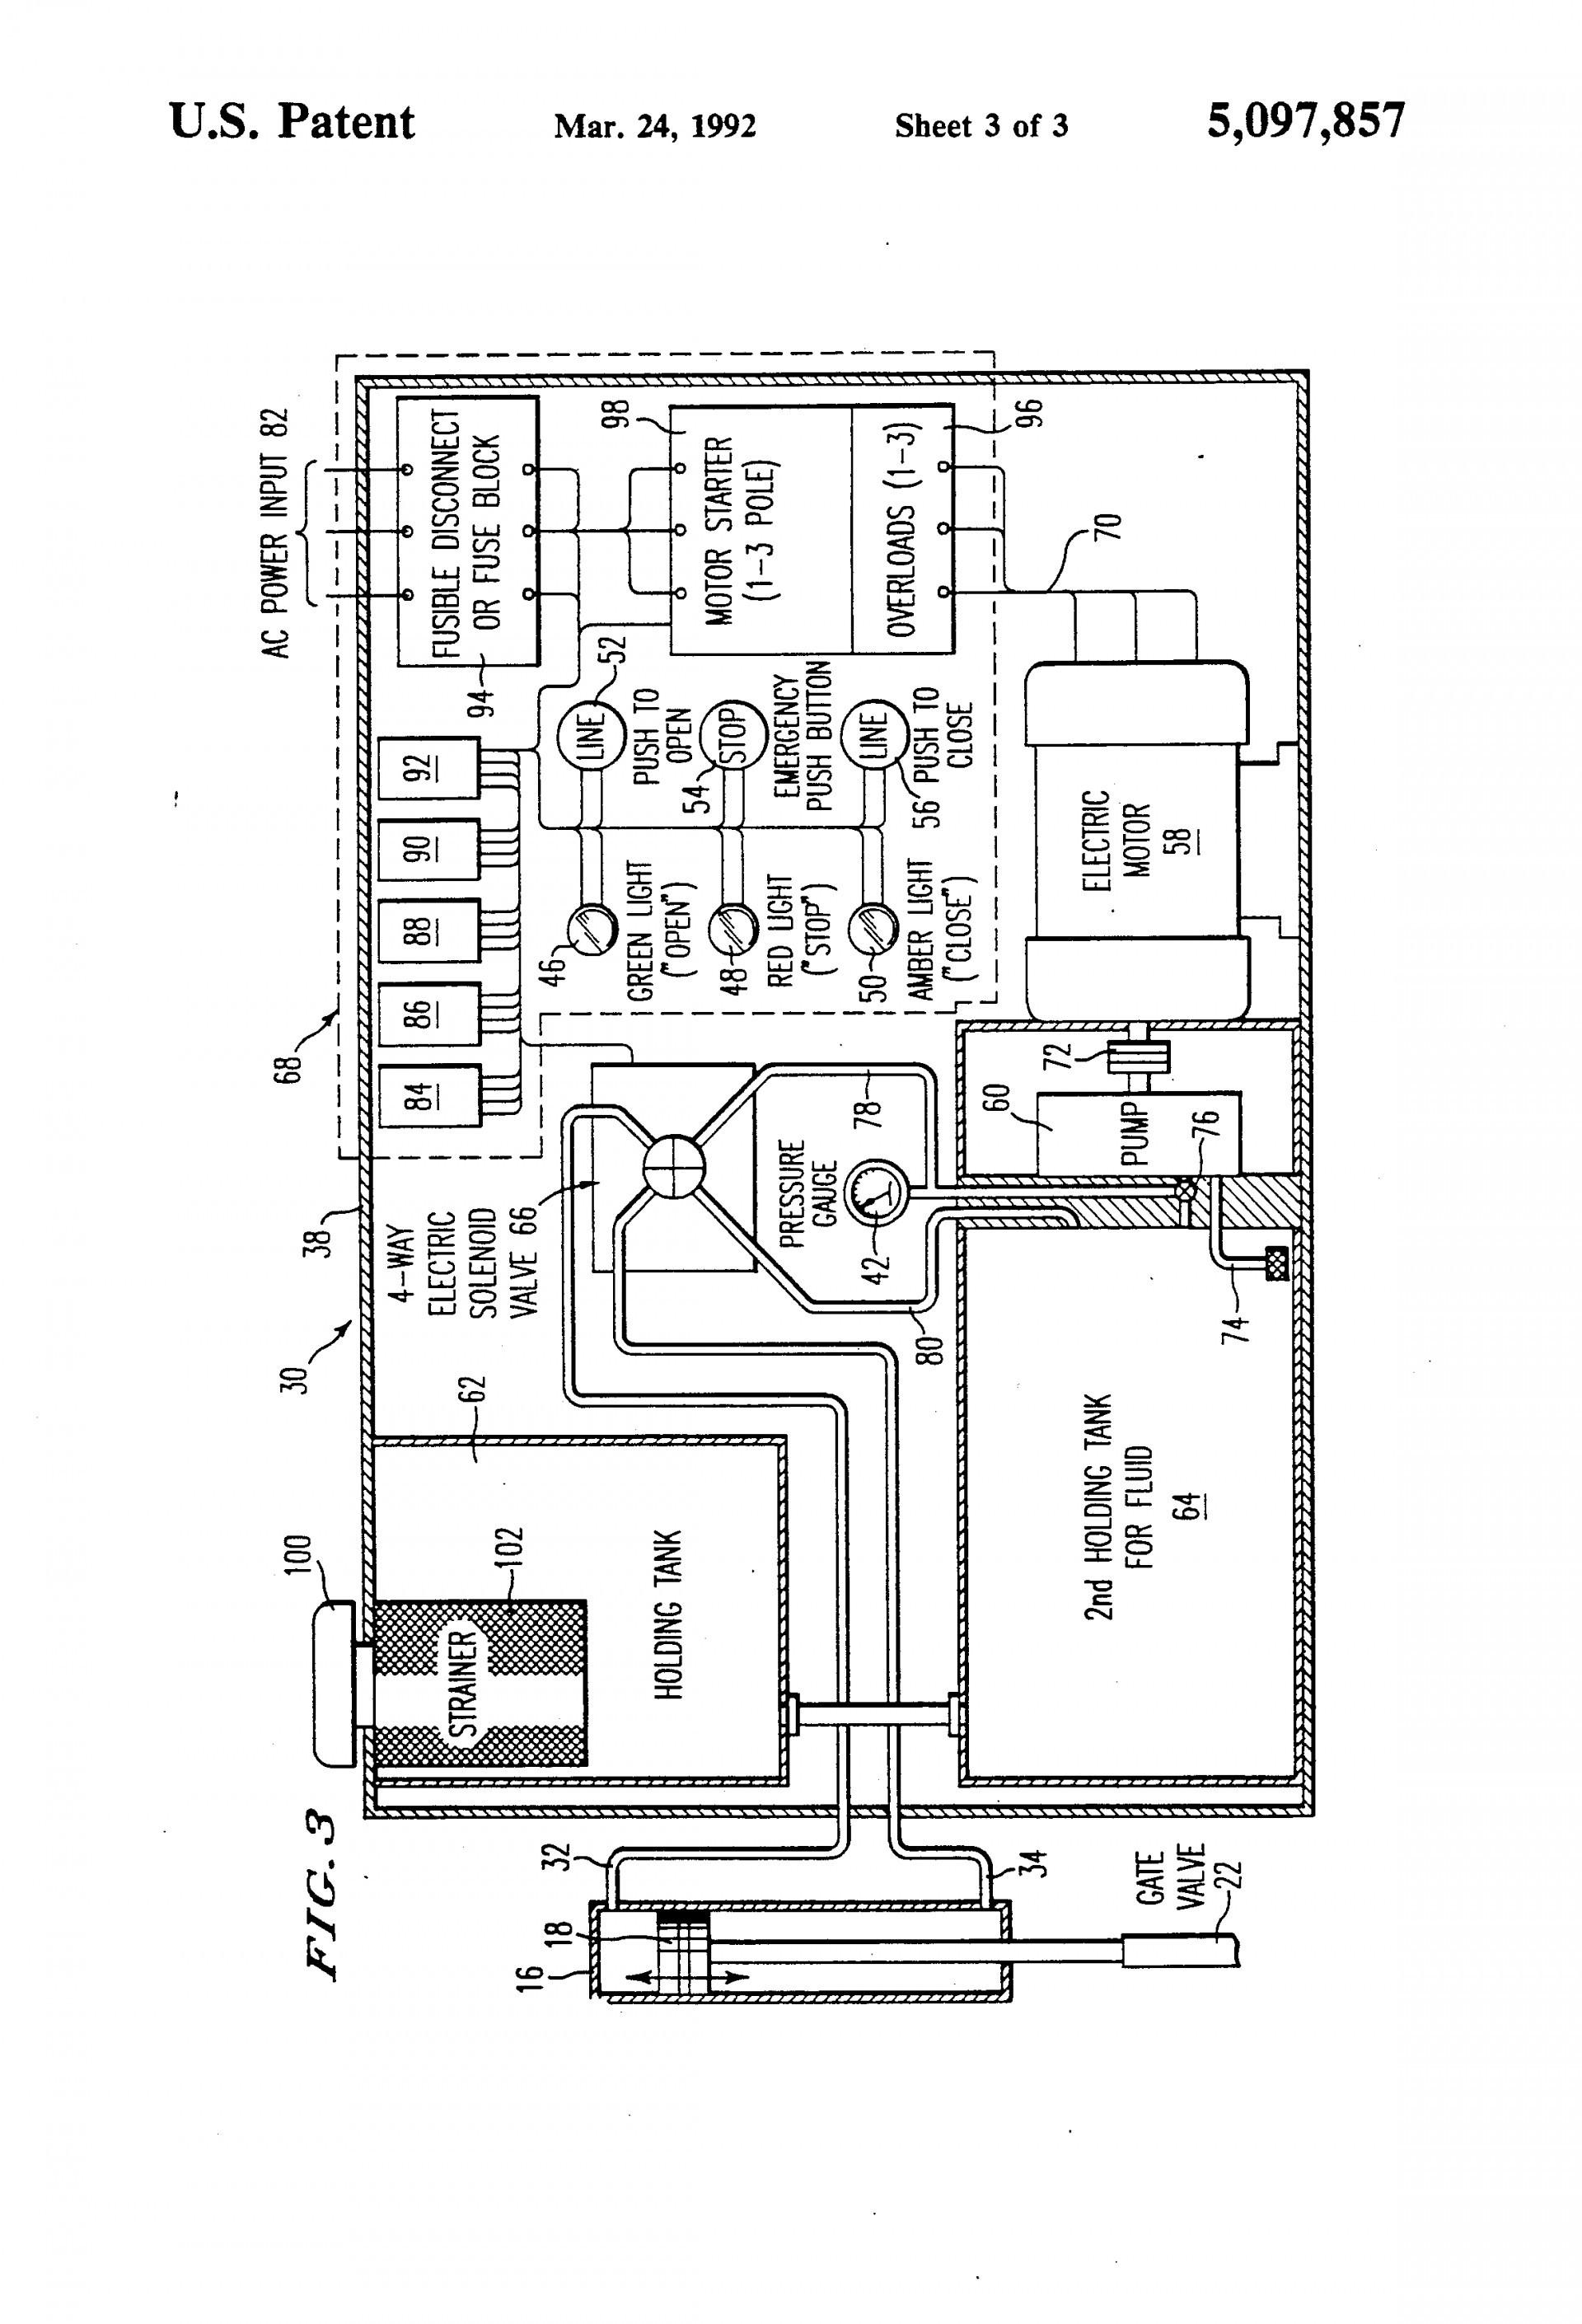 valve actuator wiring diagram on rotork actuator wiring diagrams